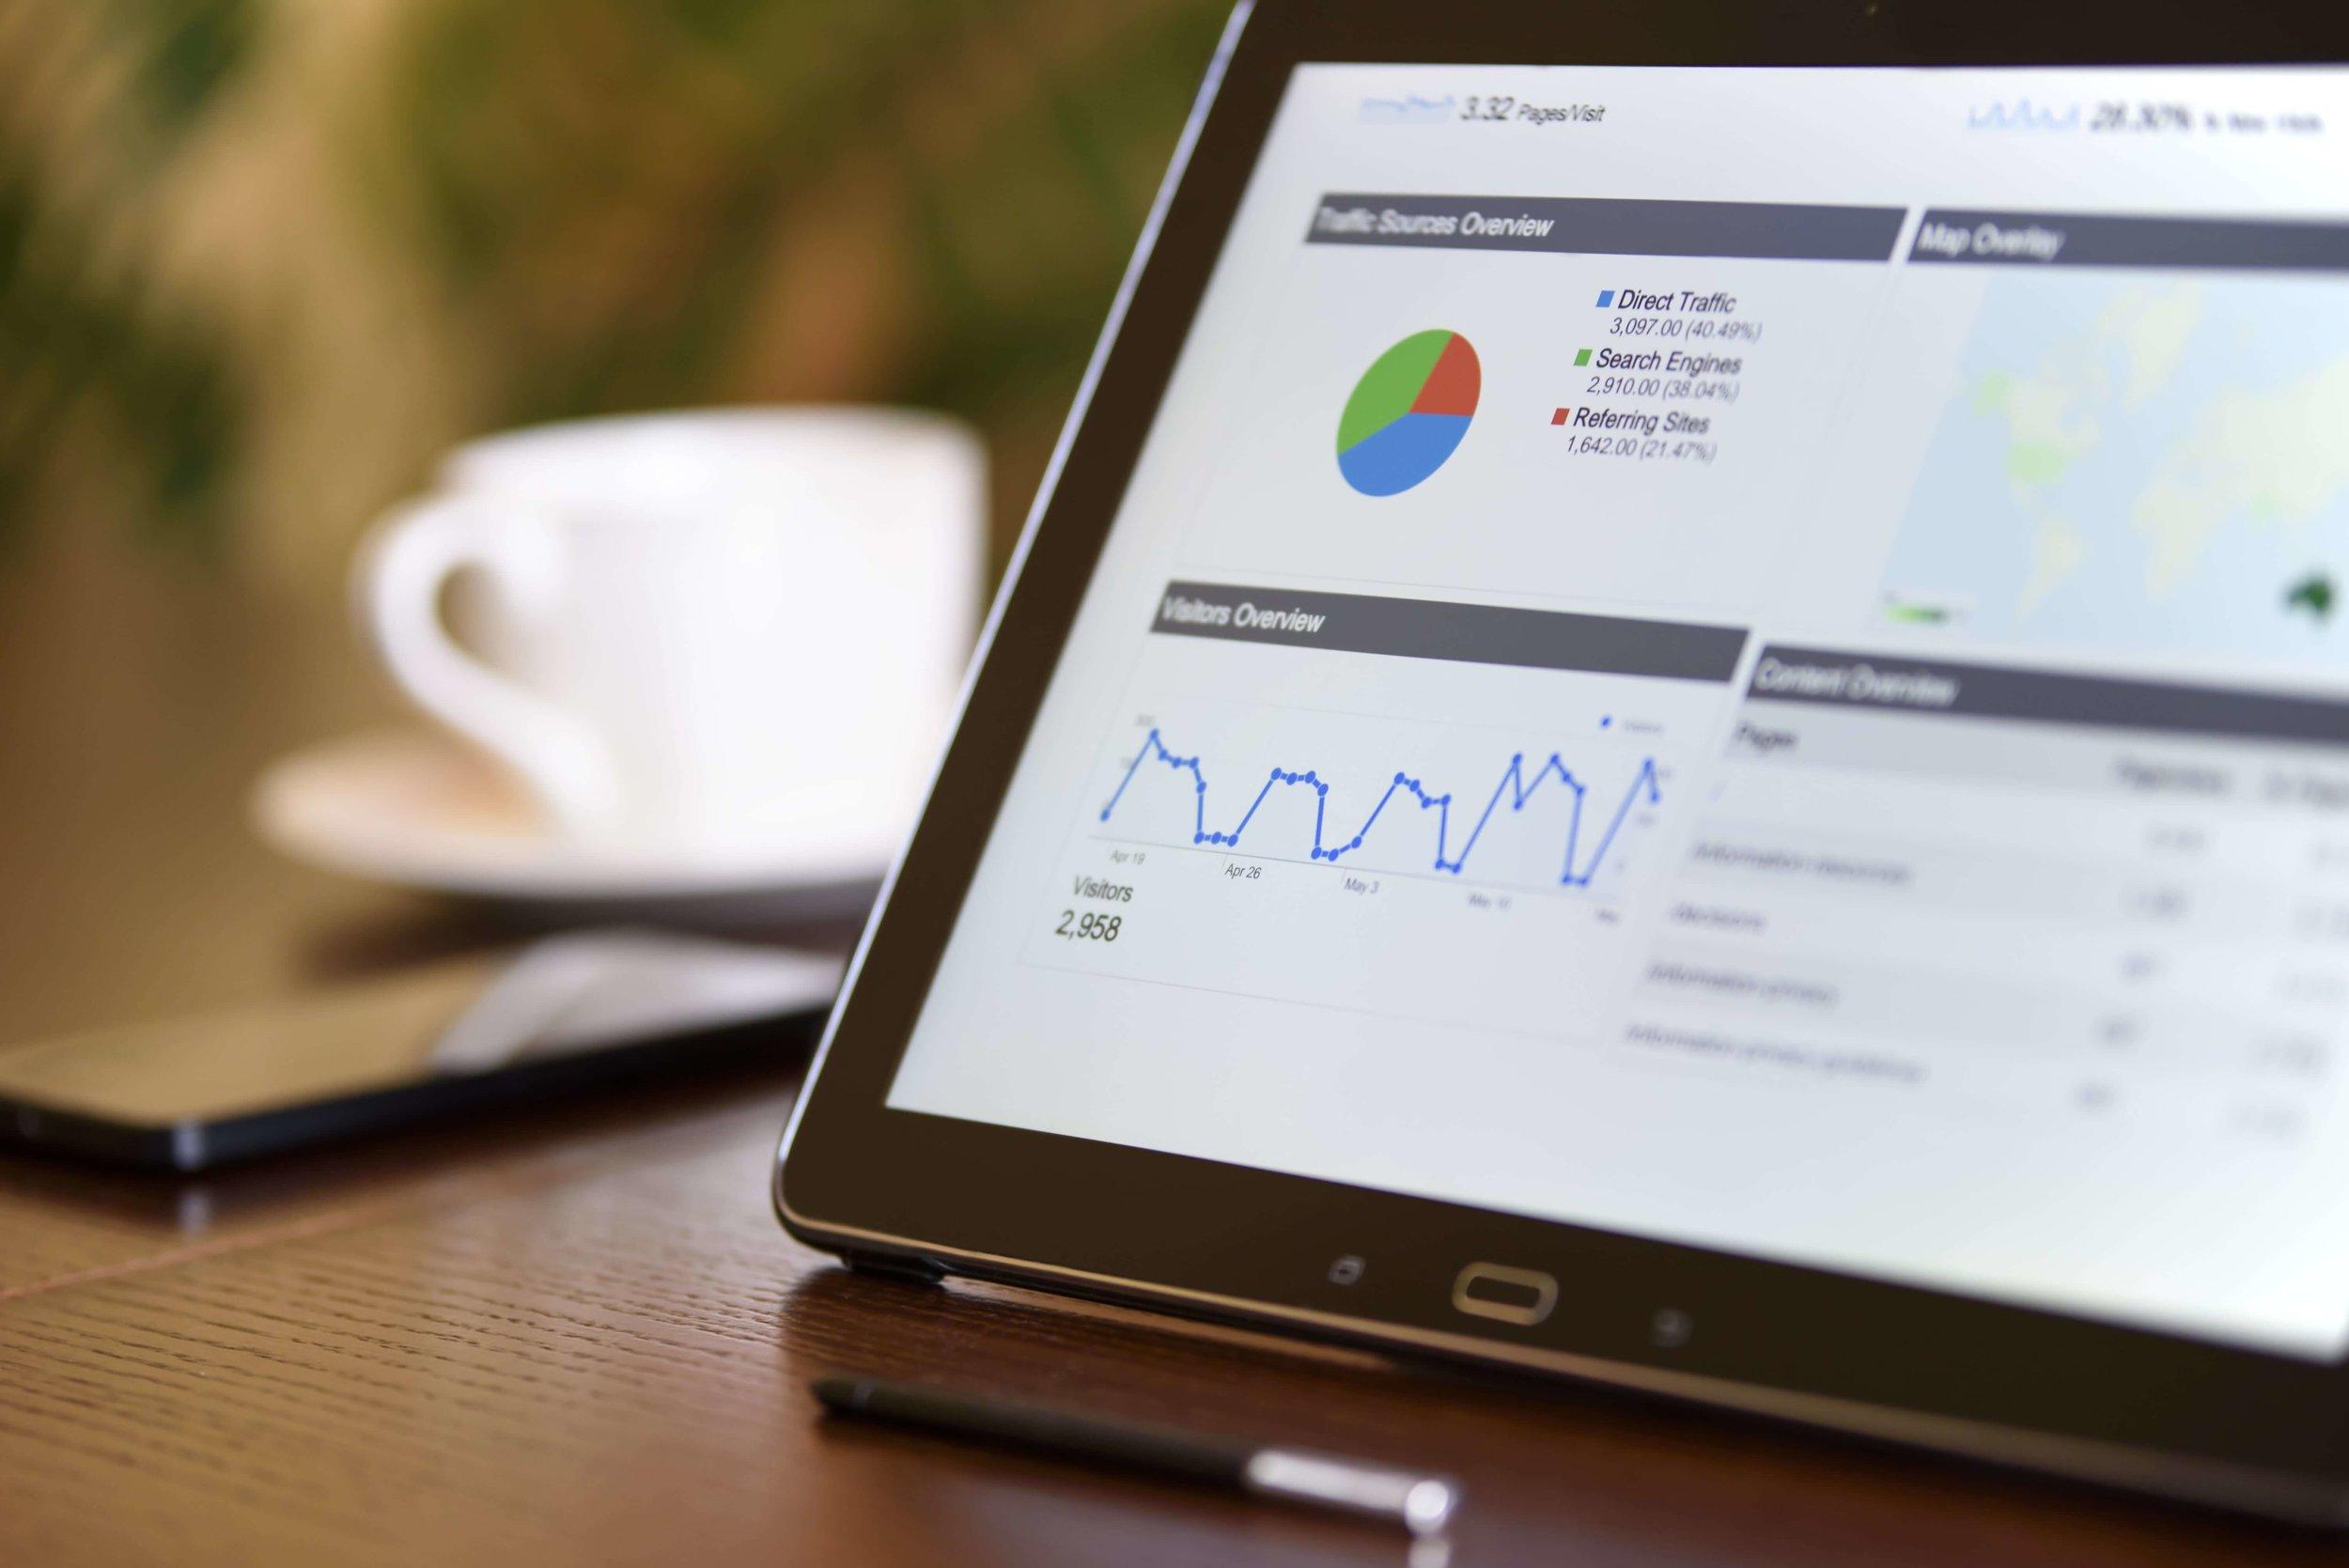 search-engine-optimization-seo-kotiadis-consulting